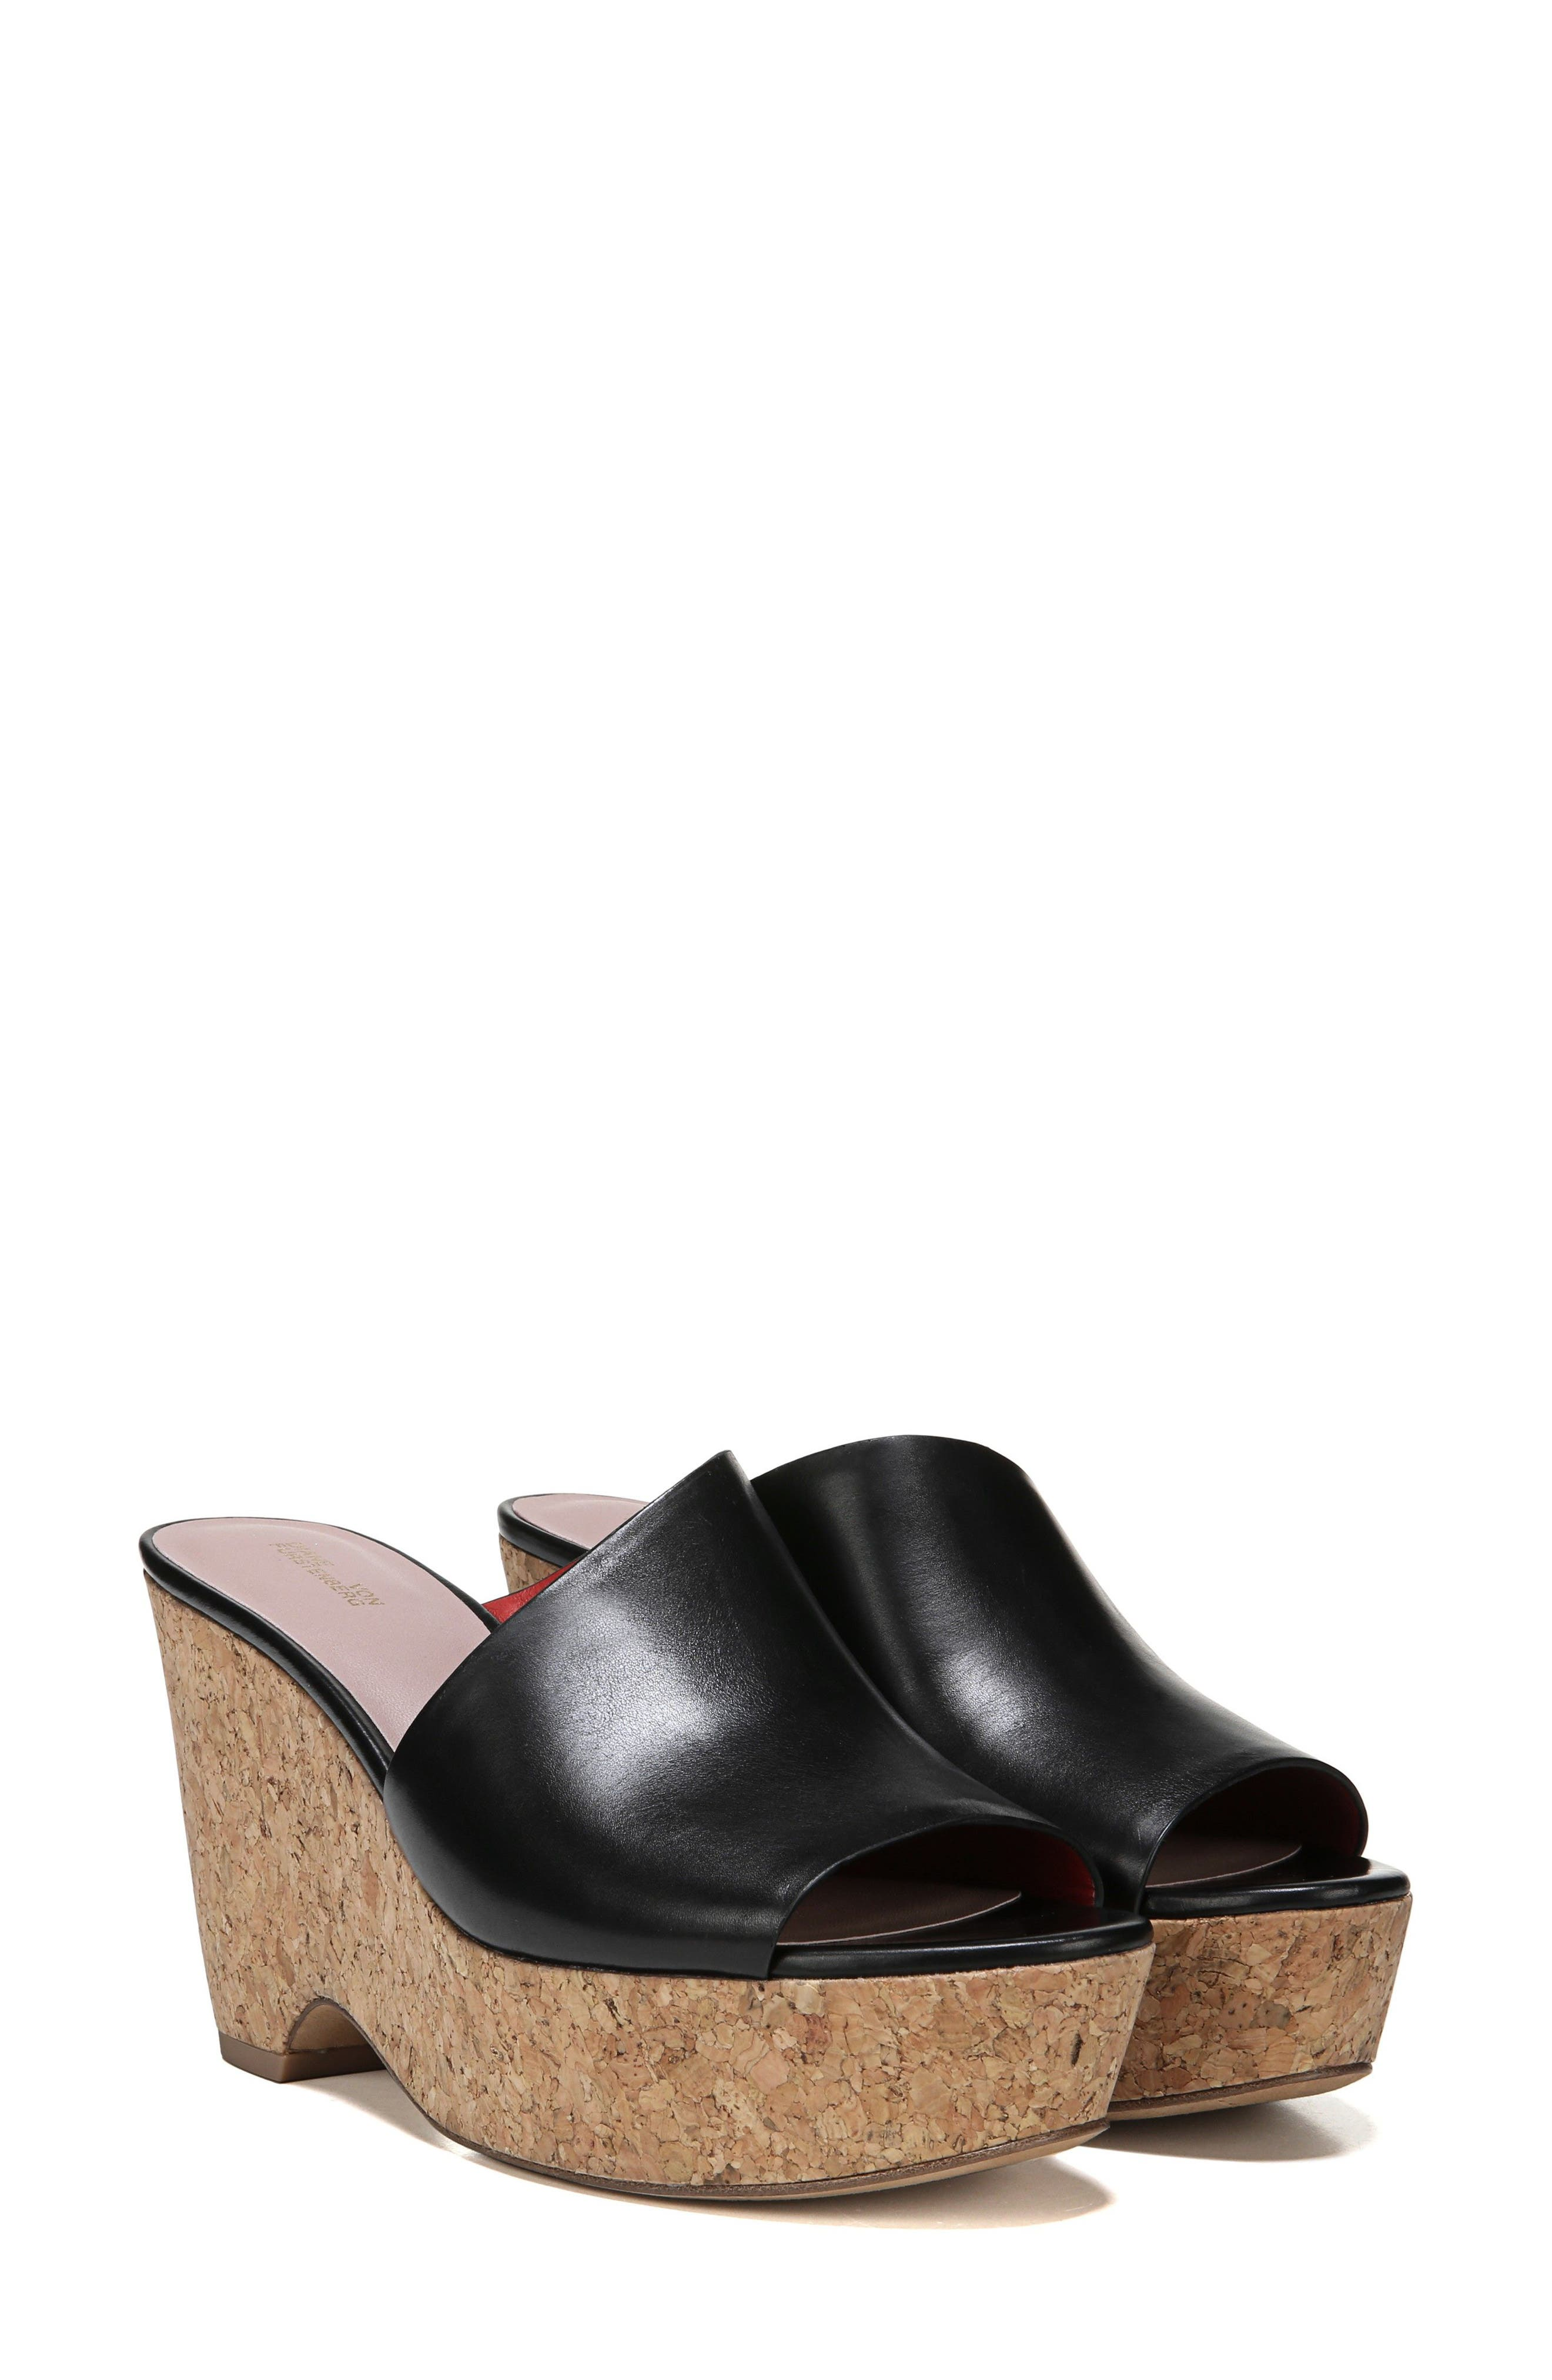 DIANE VON FURSTENBERG Bonnie Wedge Slide Sandal, Main, color, 001